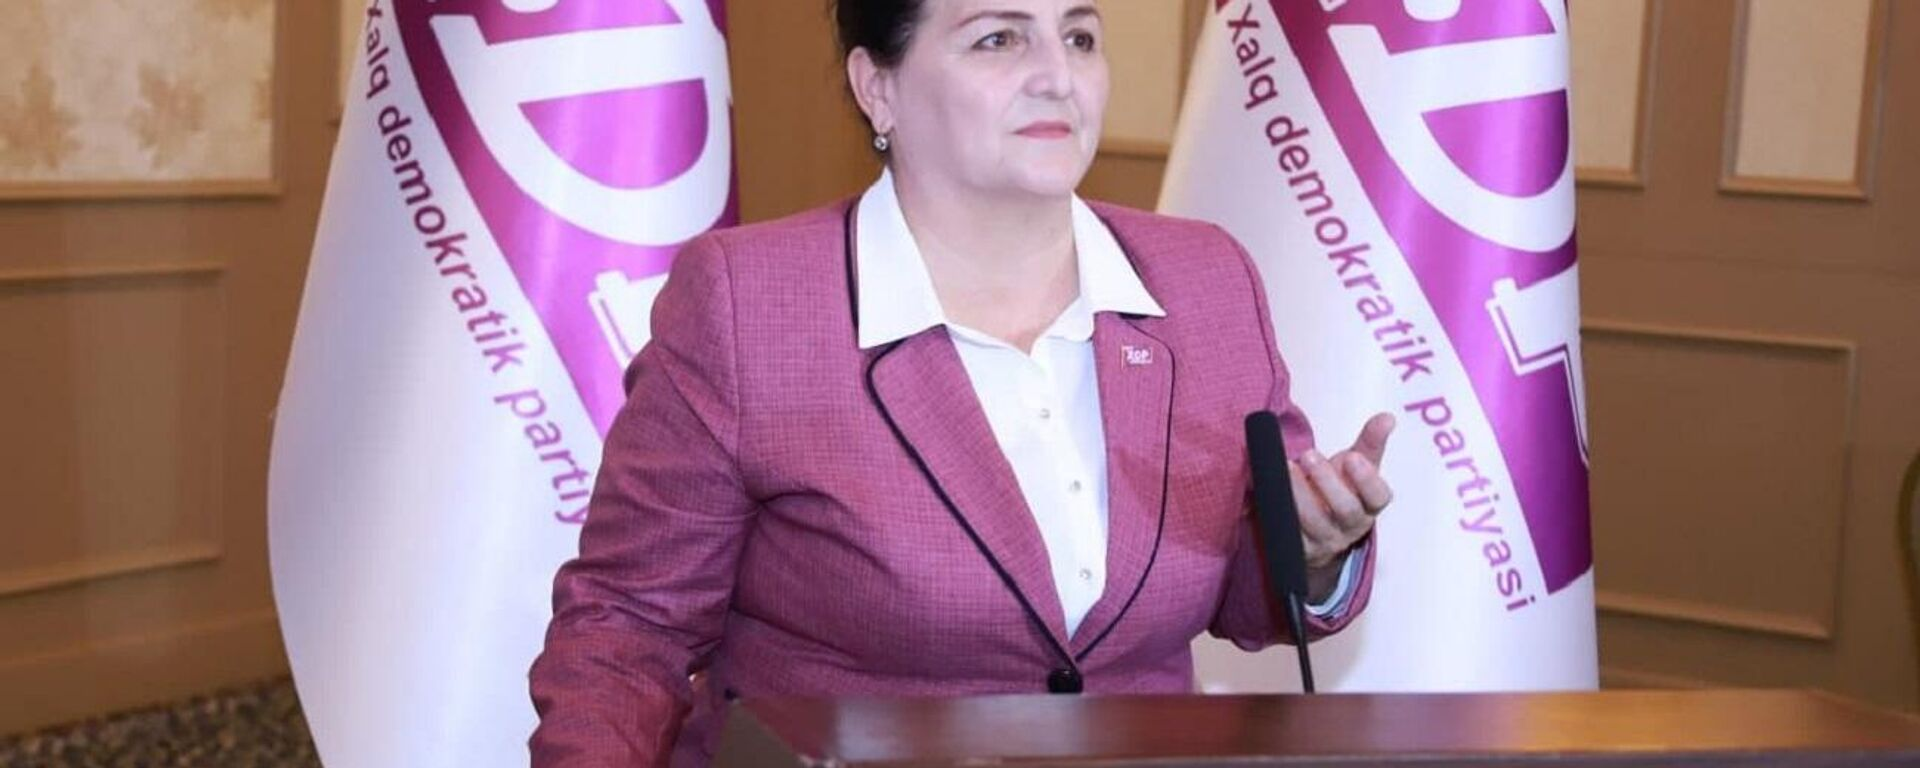 Kandidat v prezidentы Uzbekistana ot NDPU Maksuda Vorisova - Sputnik Oʻzbekiston, 1920, 06.09.2021